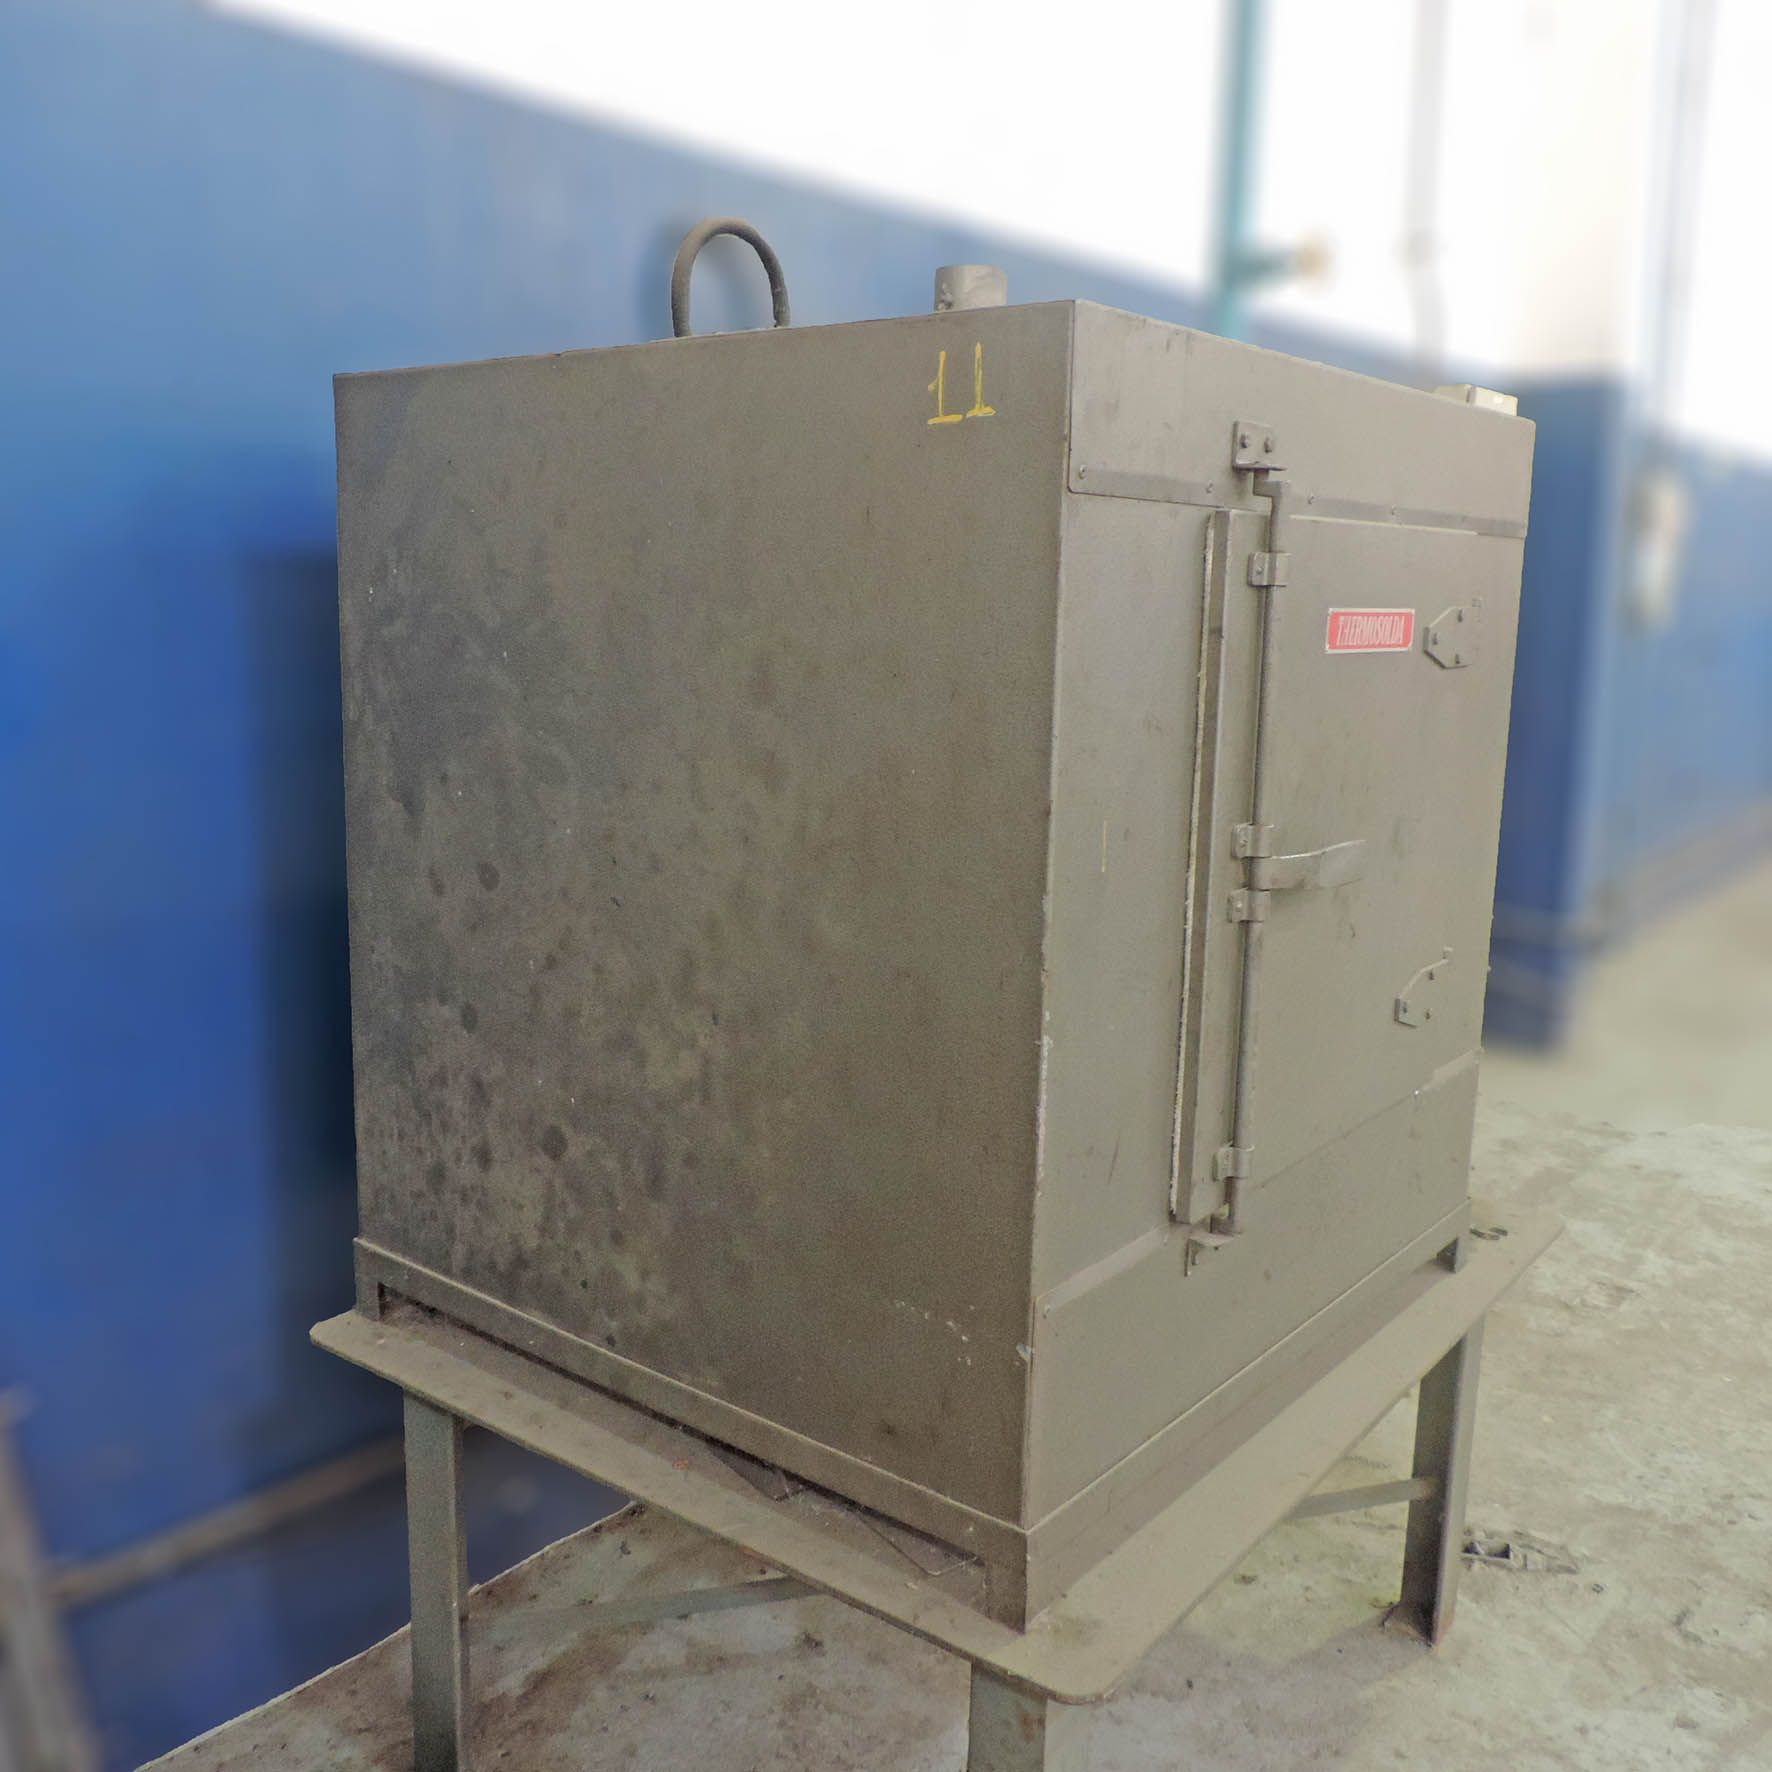 Estufa Thermo Solda Modelo 204 SP2 - Usada